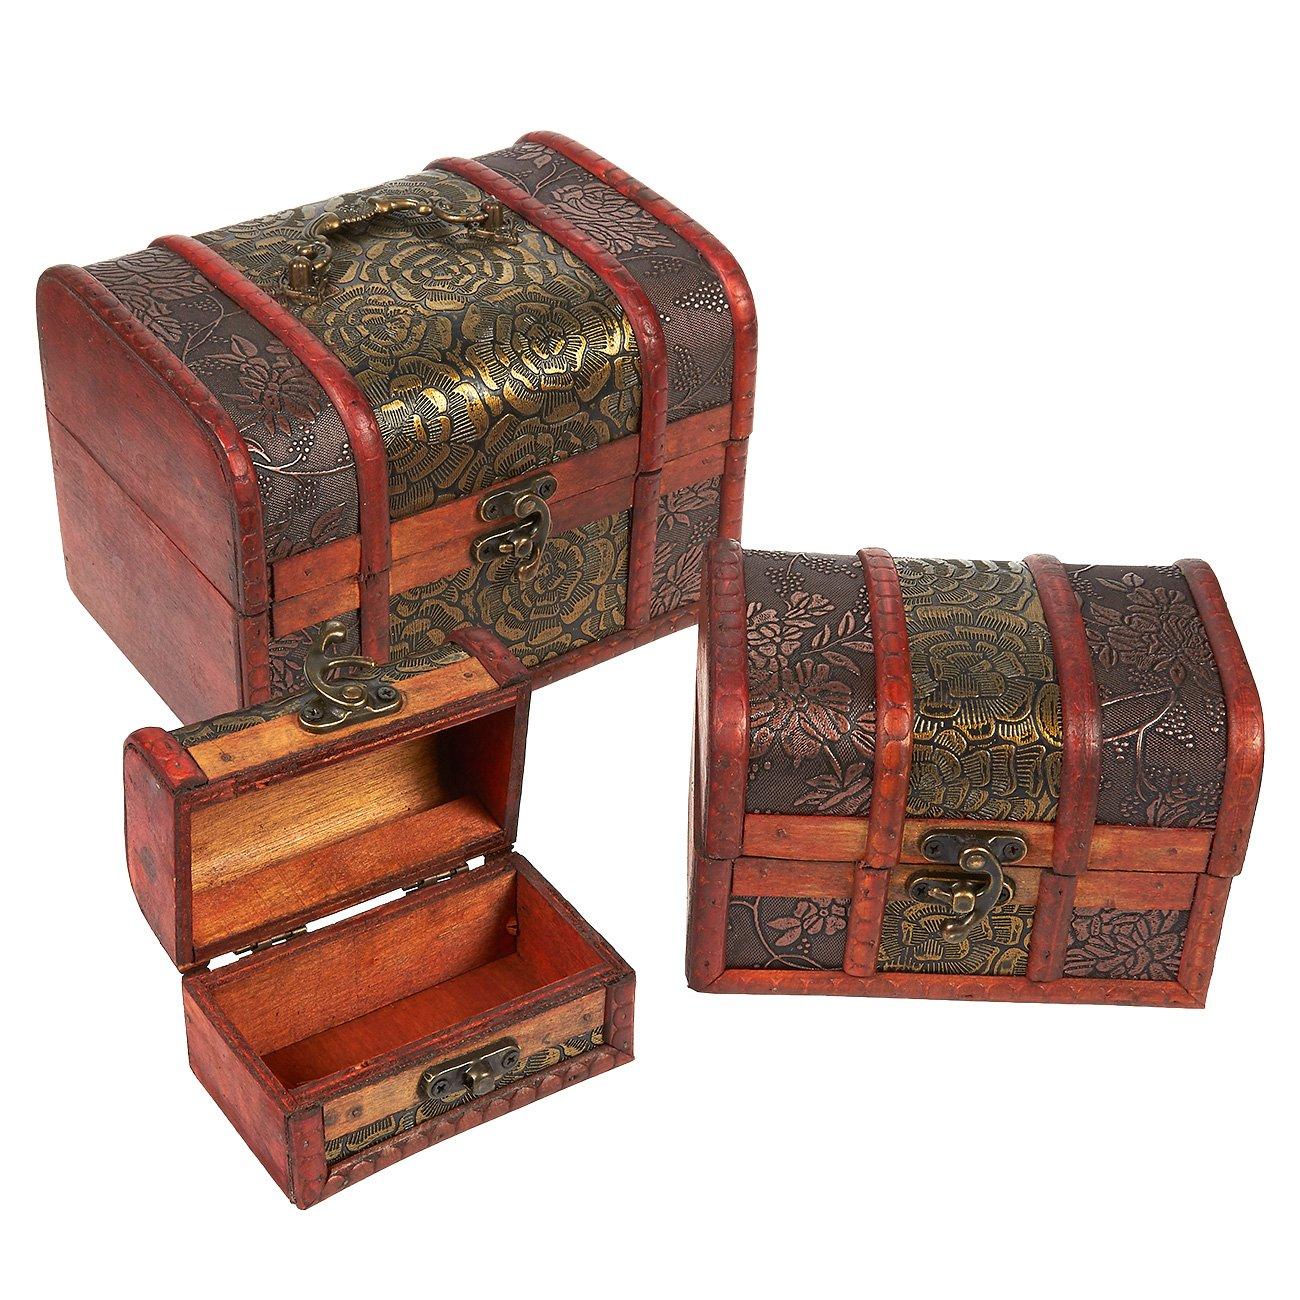 3 Piece Wooden Treasure Box - Keepsake Box - Treasure Chest with Flower Motif for Jewelry